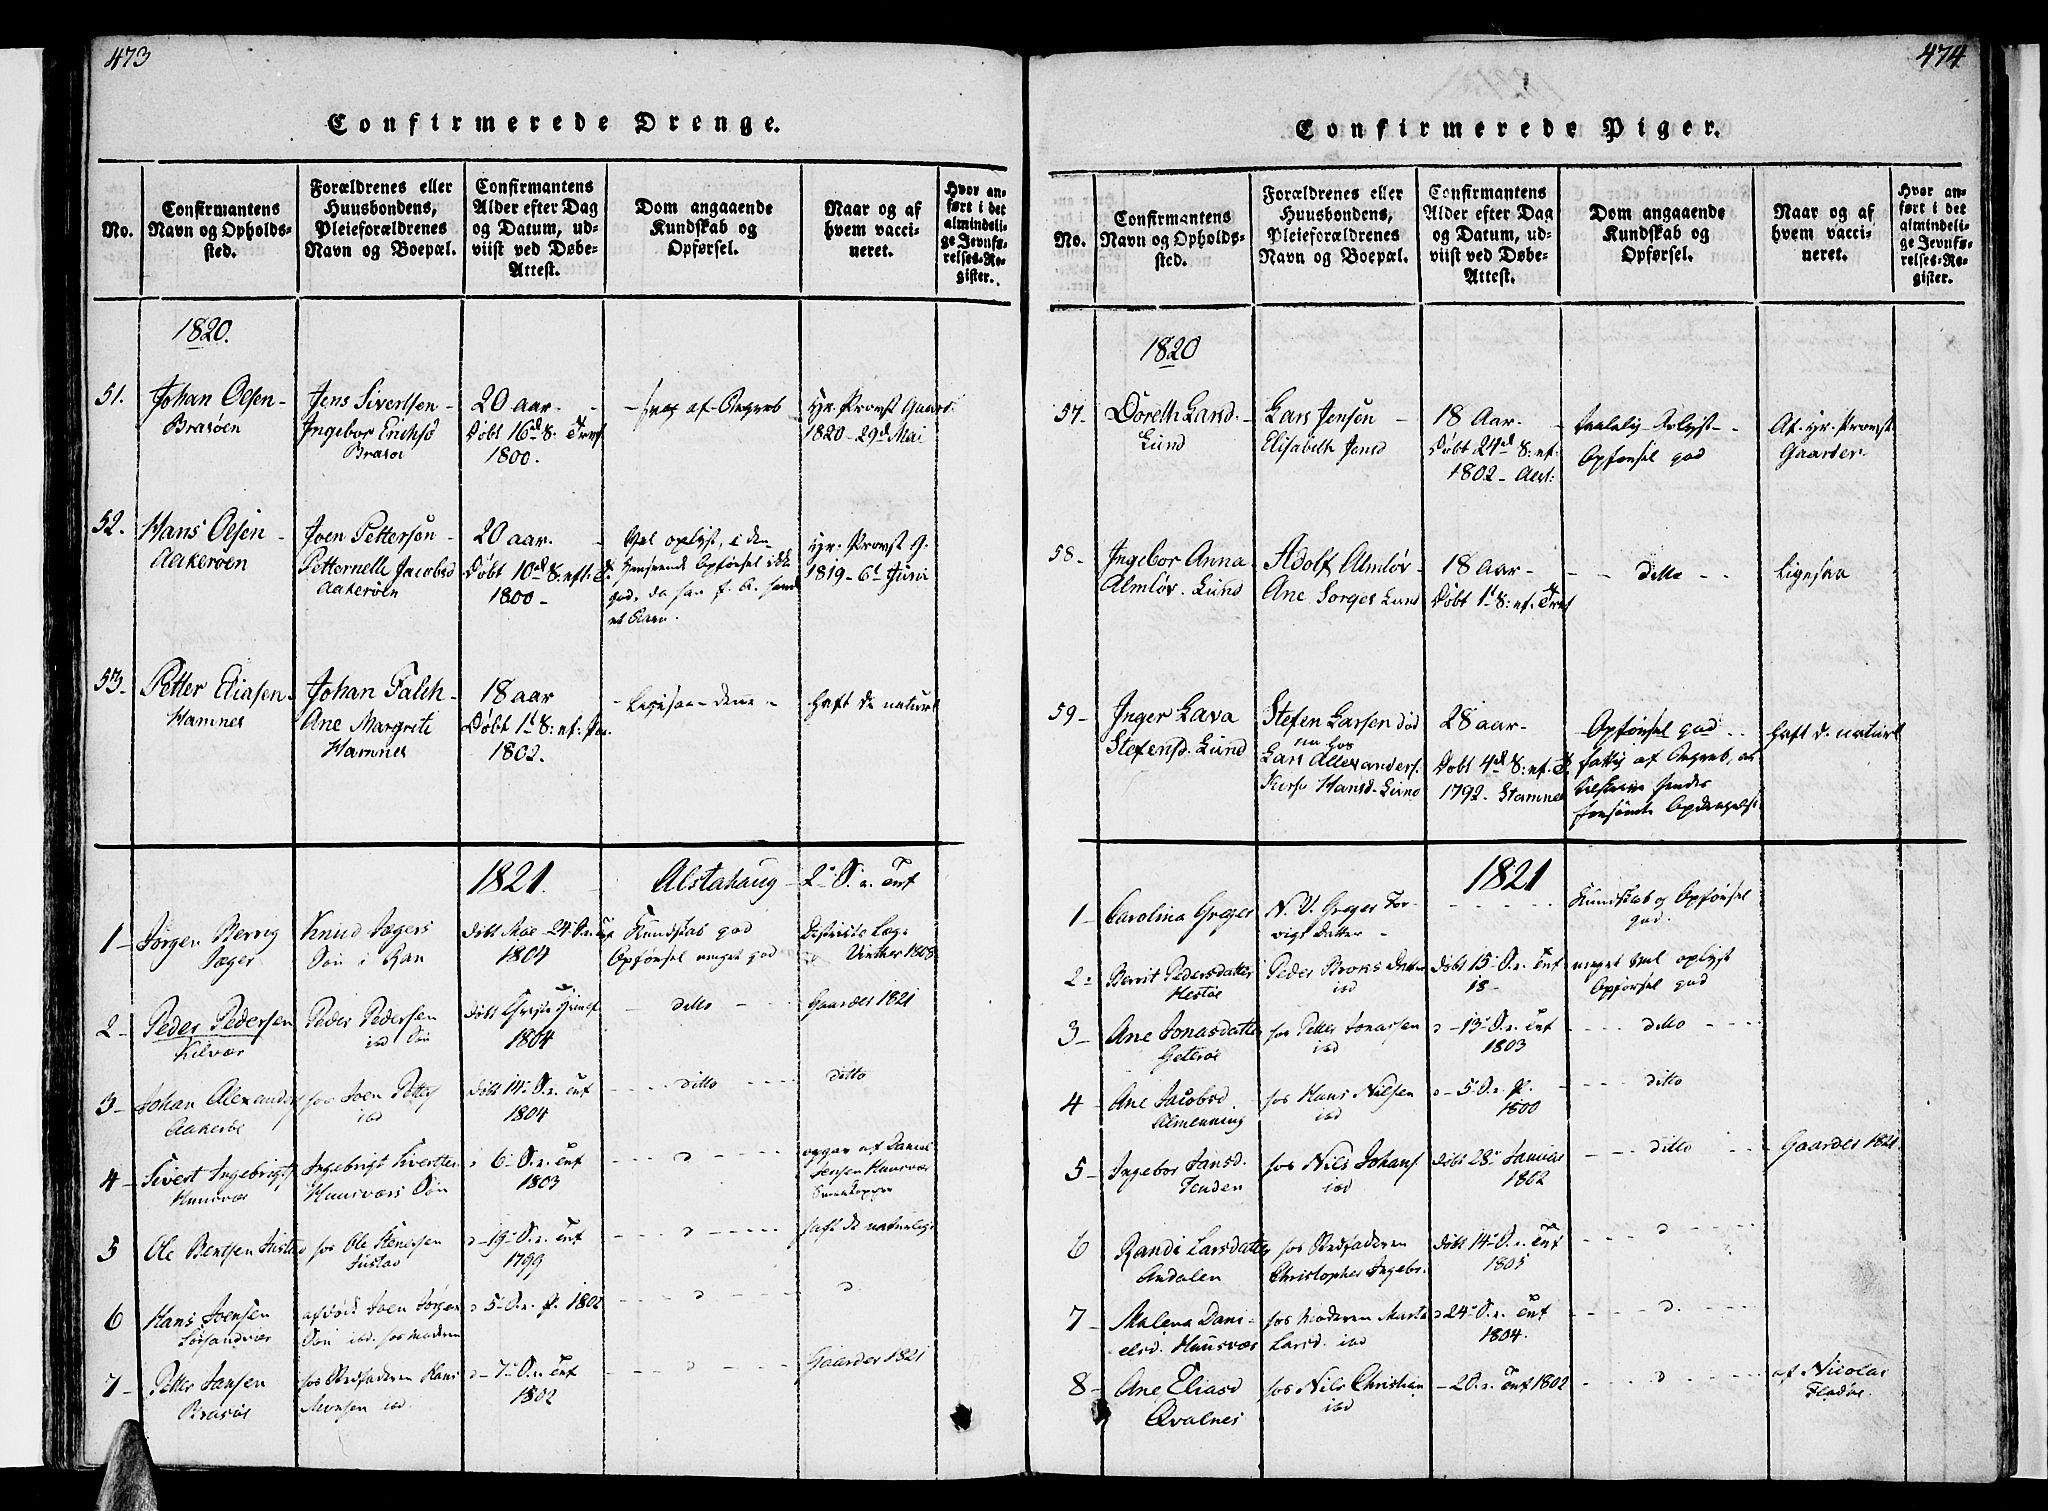 SAT, Ministerialprotokoller, klokkerbøker og fødselsregistre - Nordland, 830/L0445: Ministerialbok nr. 830A09, 1820-1830, s. 473-474